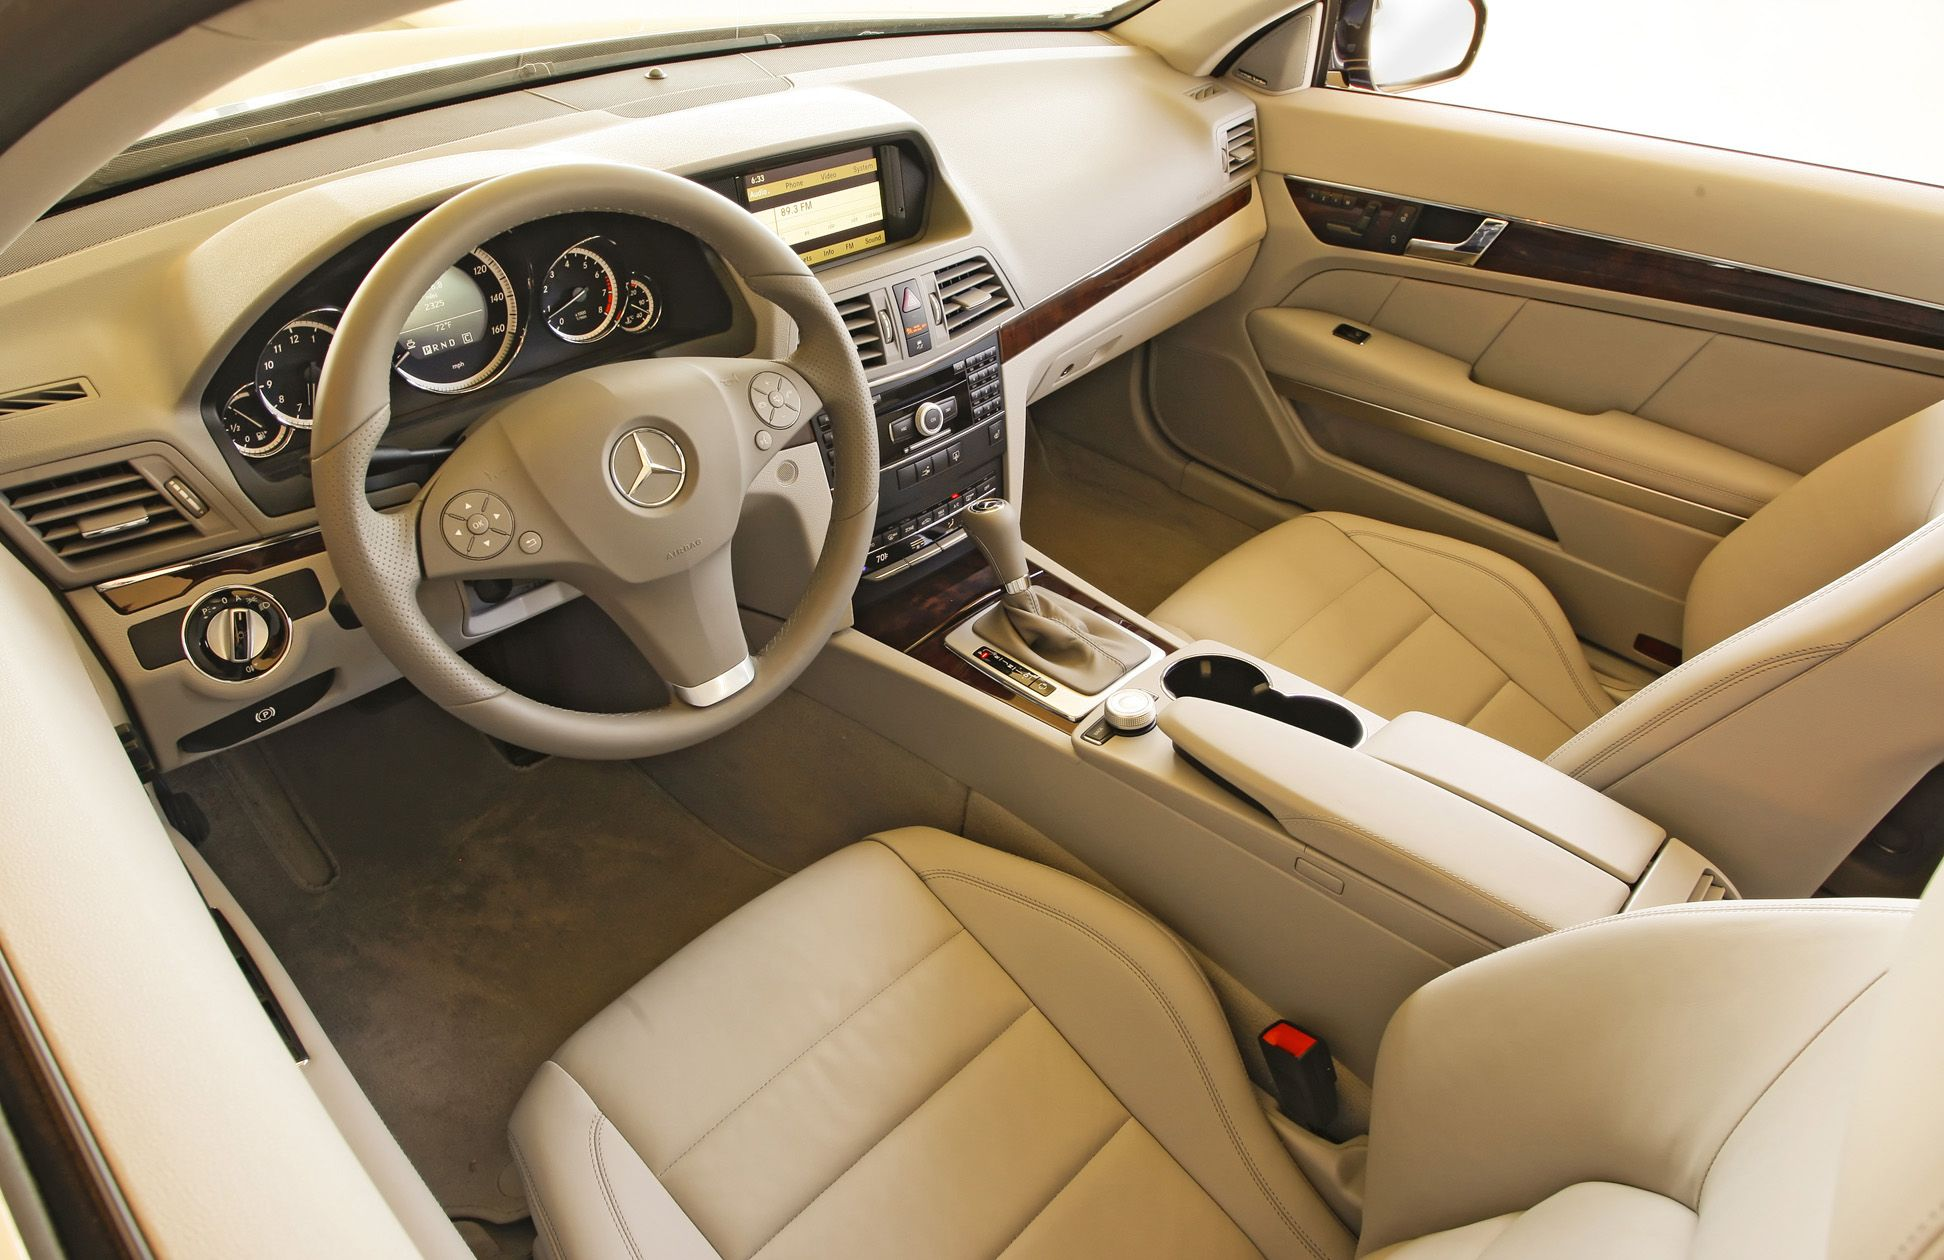 2010 Mercedez Benz E350 Coupe Beige Interior Eurocar News